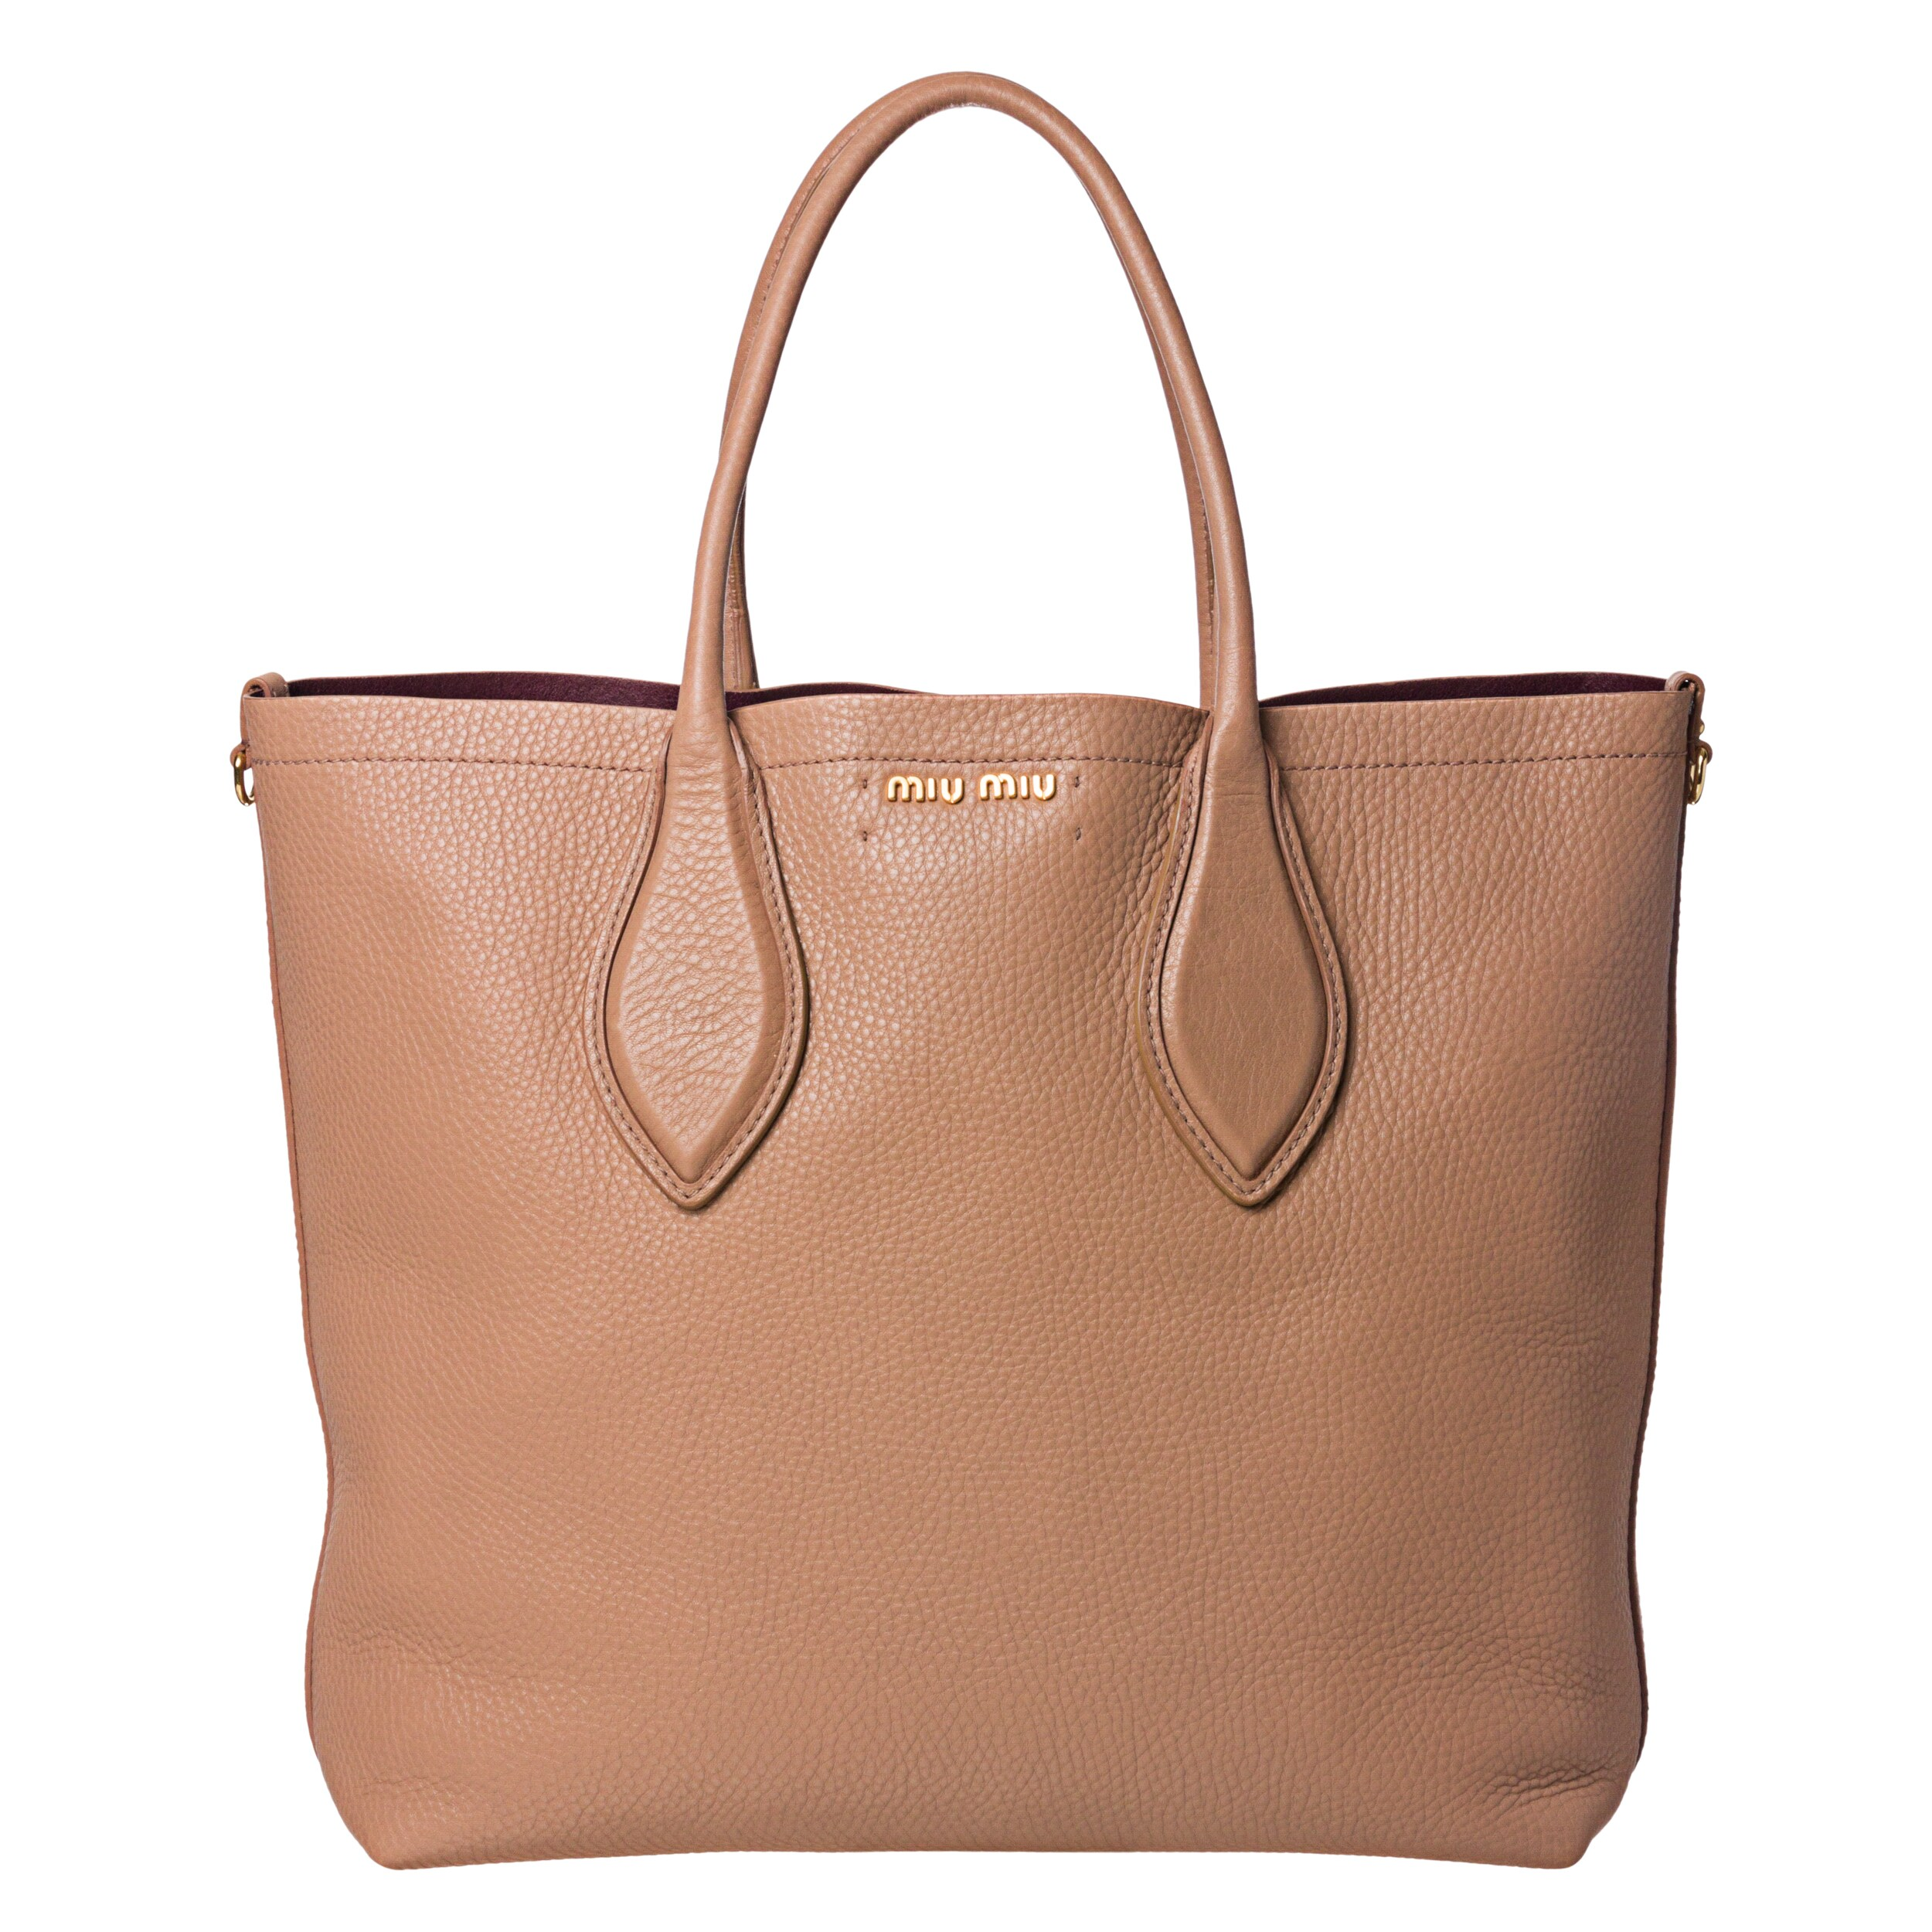 Miu Miu Large Peach Leather Tote Bag